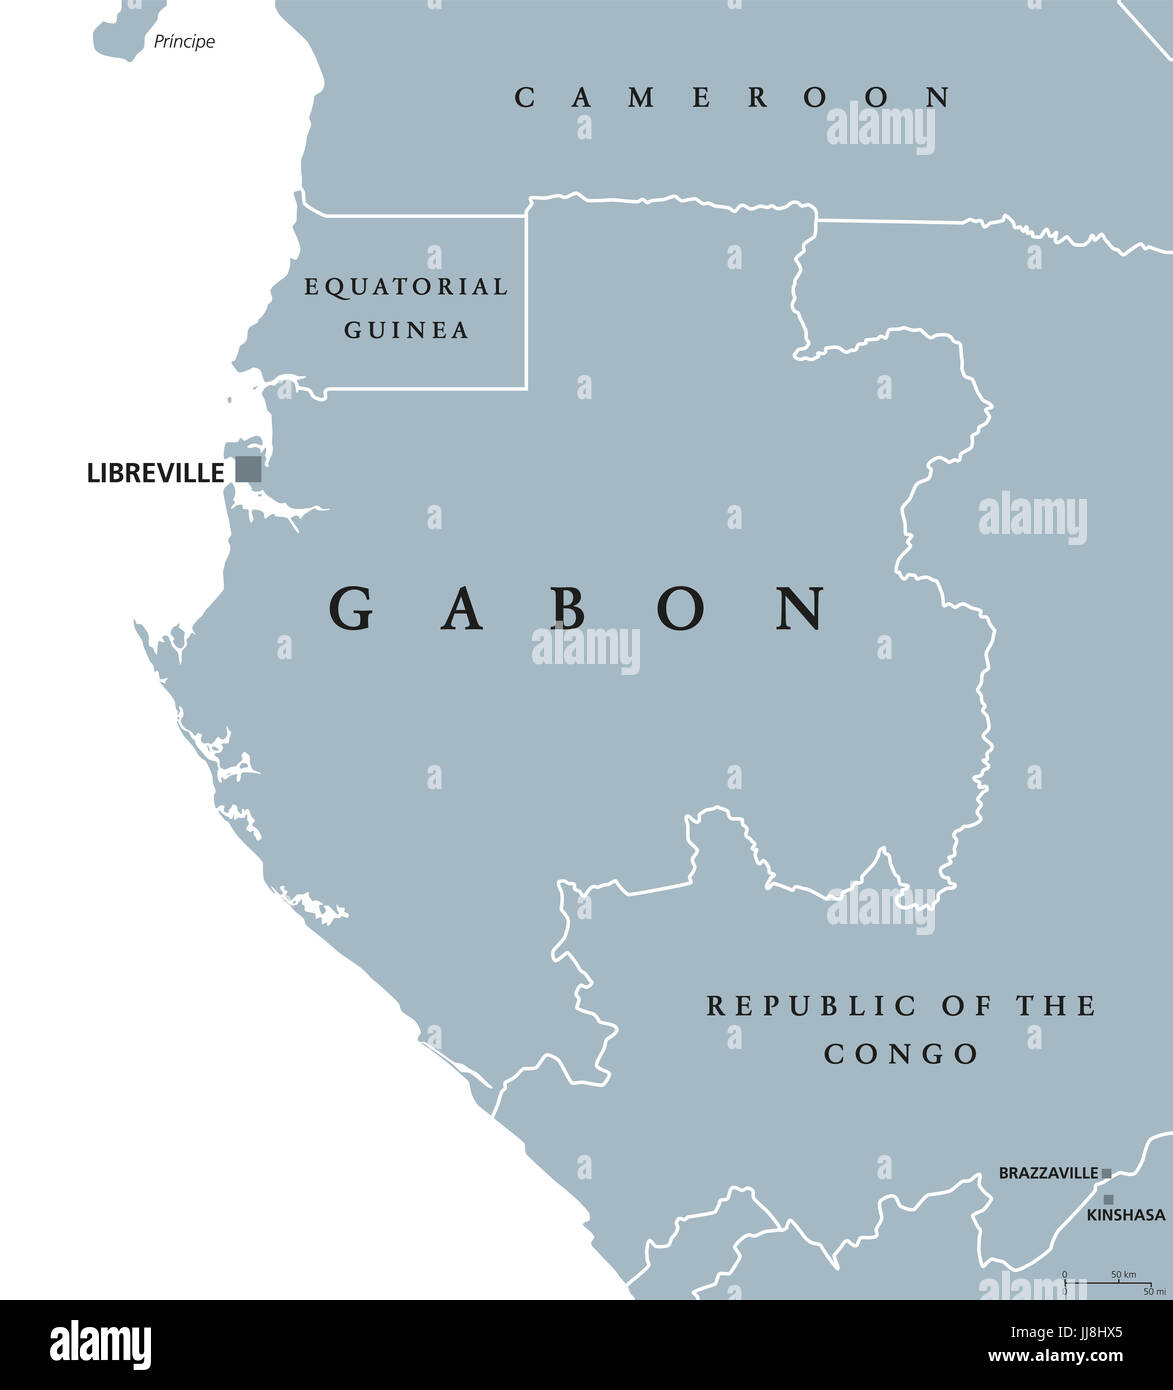 Gabon Political Map With Capital Libreville Gabonese Republic A - Where is gabon on the world map